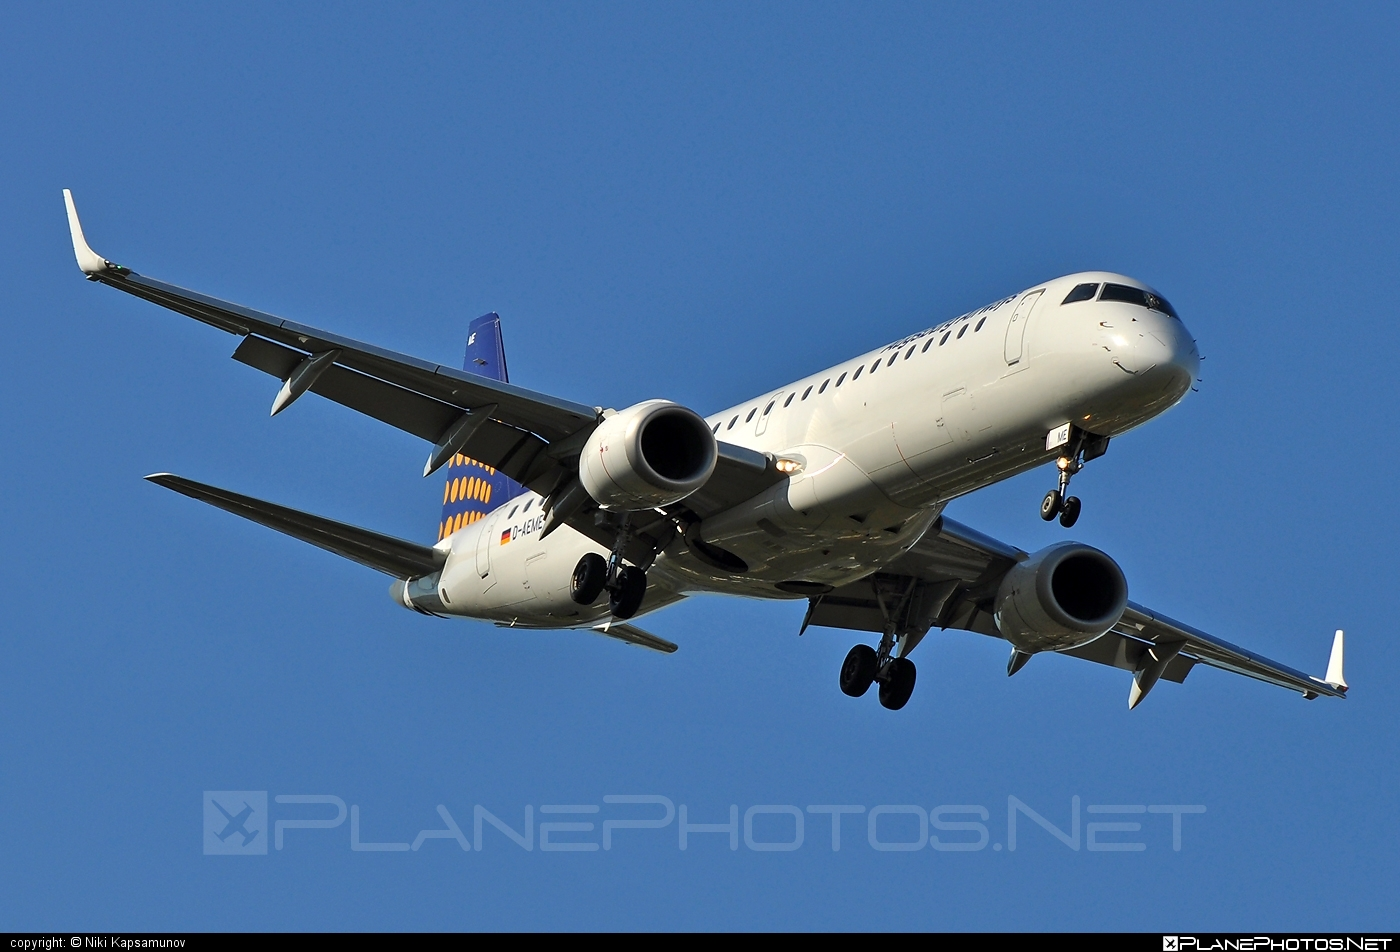 Embraer E195LR (ERJ-190-200LR) - D-AEME operated by Augsburg Airways #e190 #e190200 #e190200lr #e195lr #embraer #embraer190200lr #embraer195 #embraer195lr